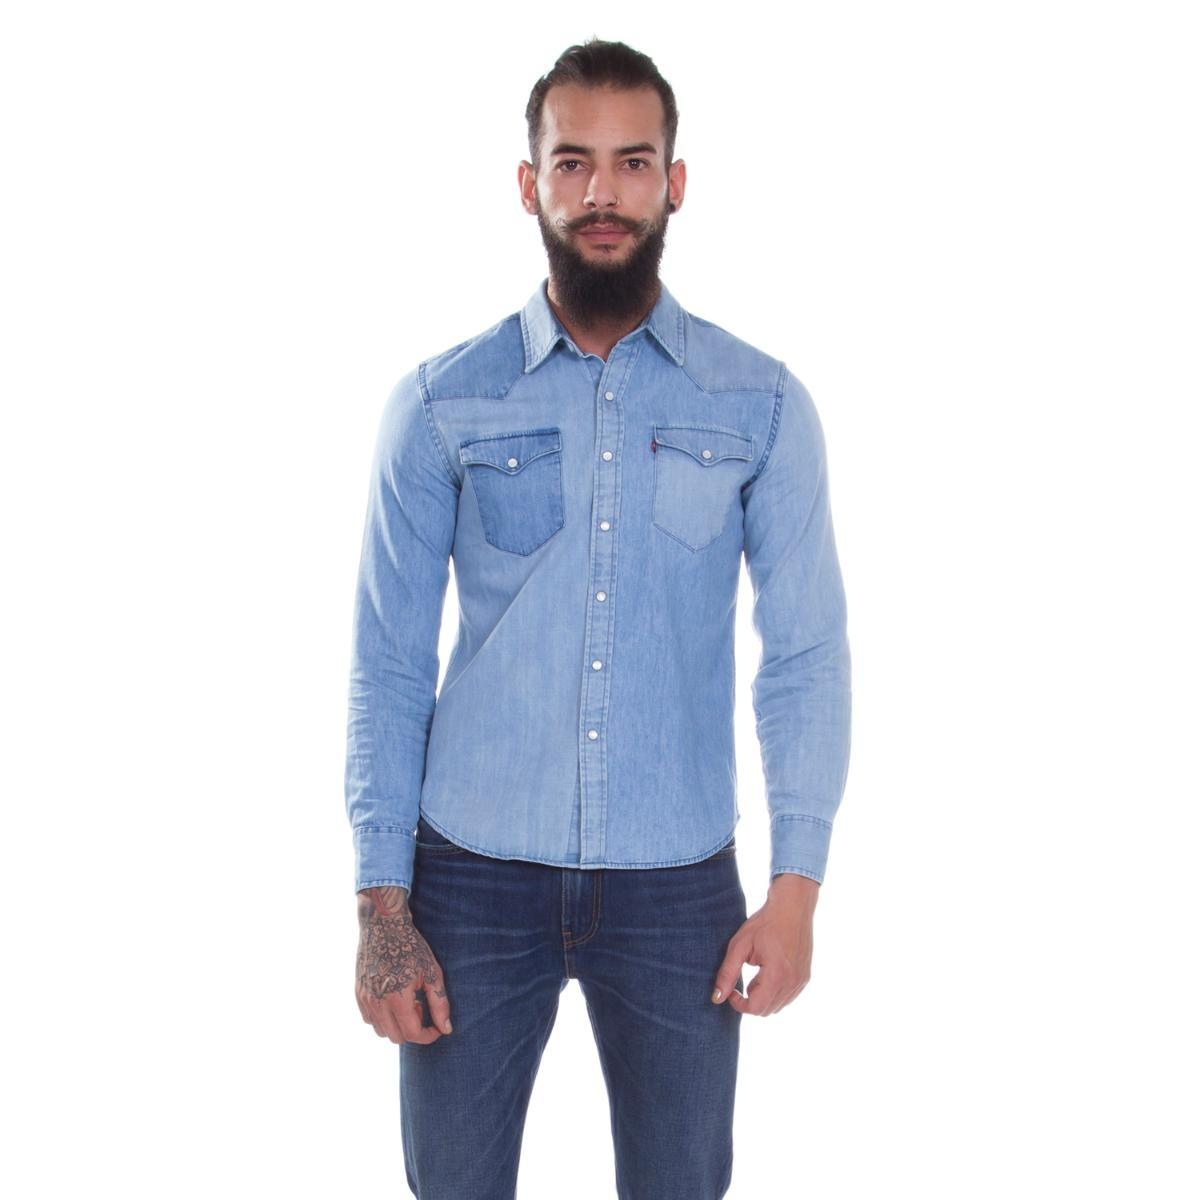 camisa levis masculina jeans classic western azul média. Carregando zoom. d49771b7267